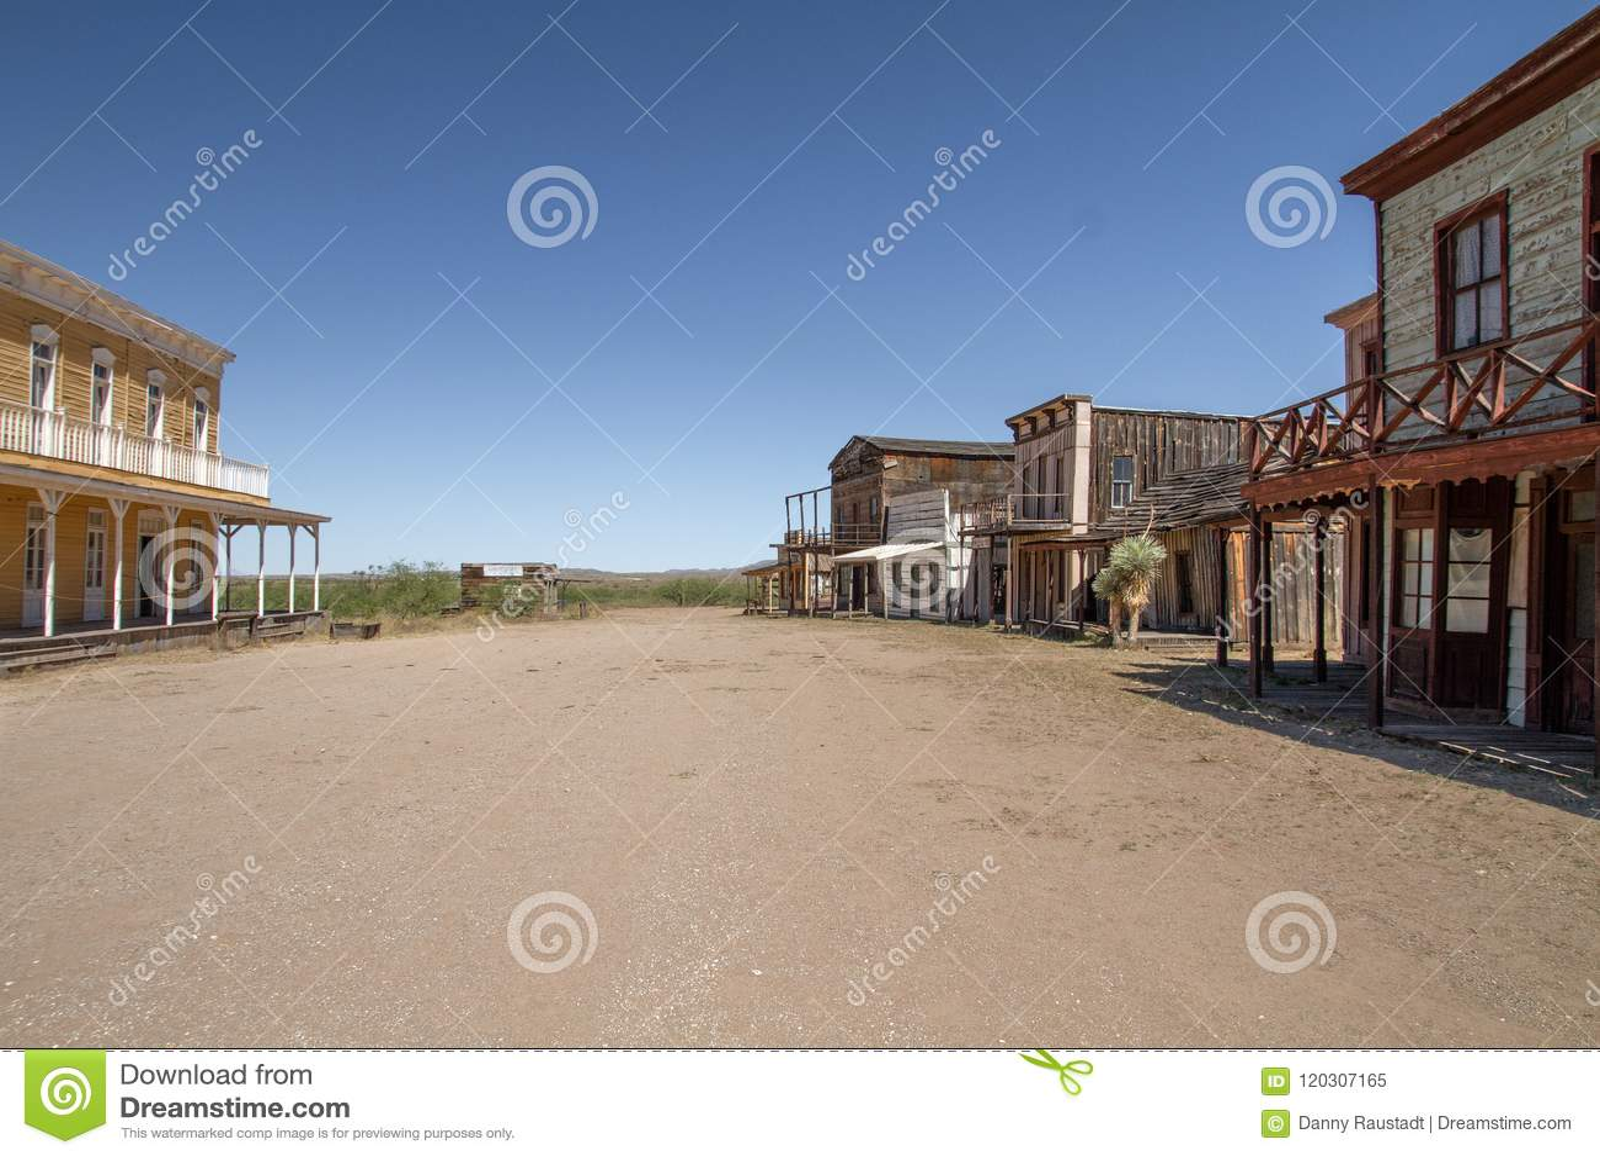 Alte wilde Westfilmbühne im Mescal, Arizona